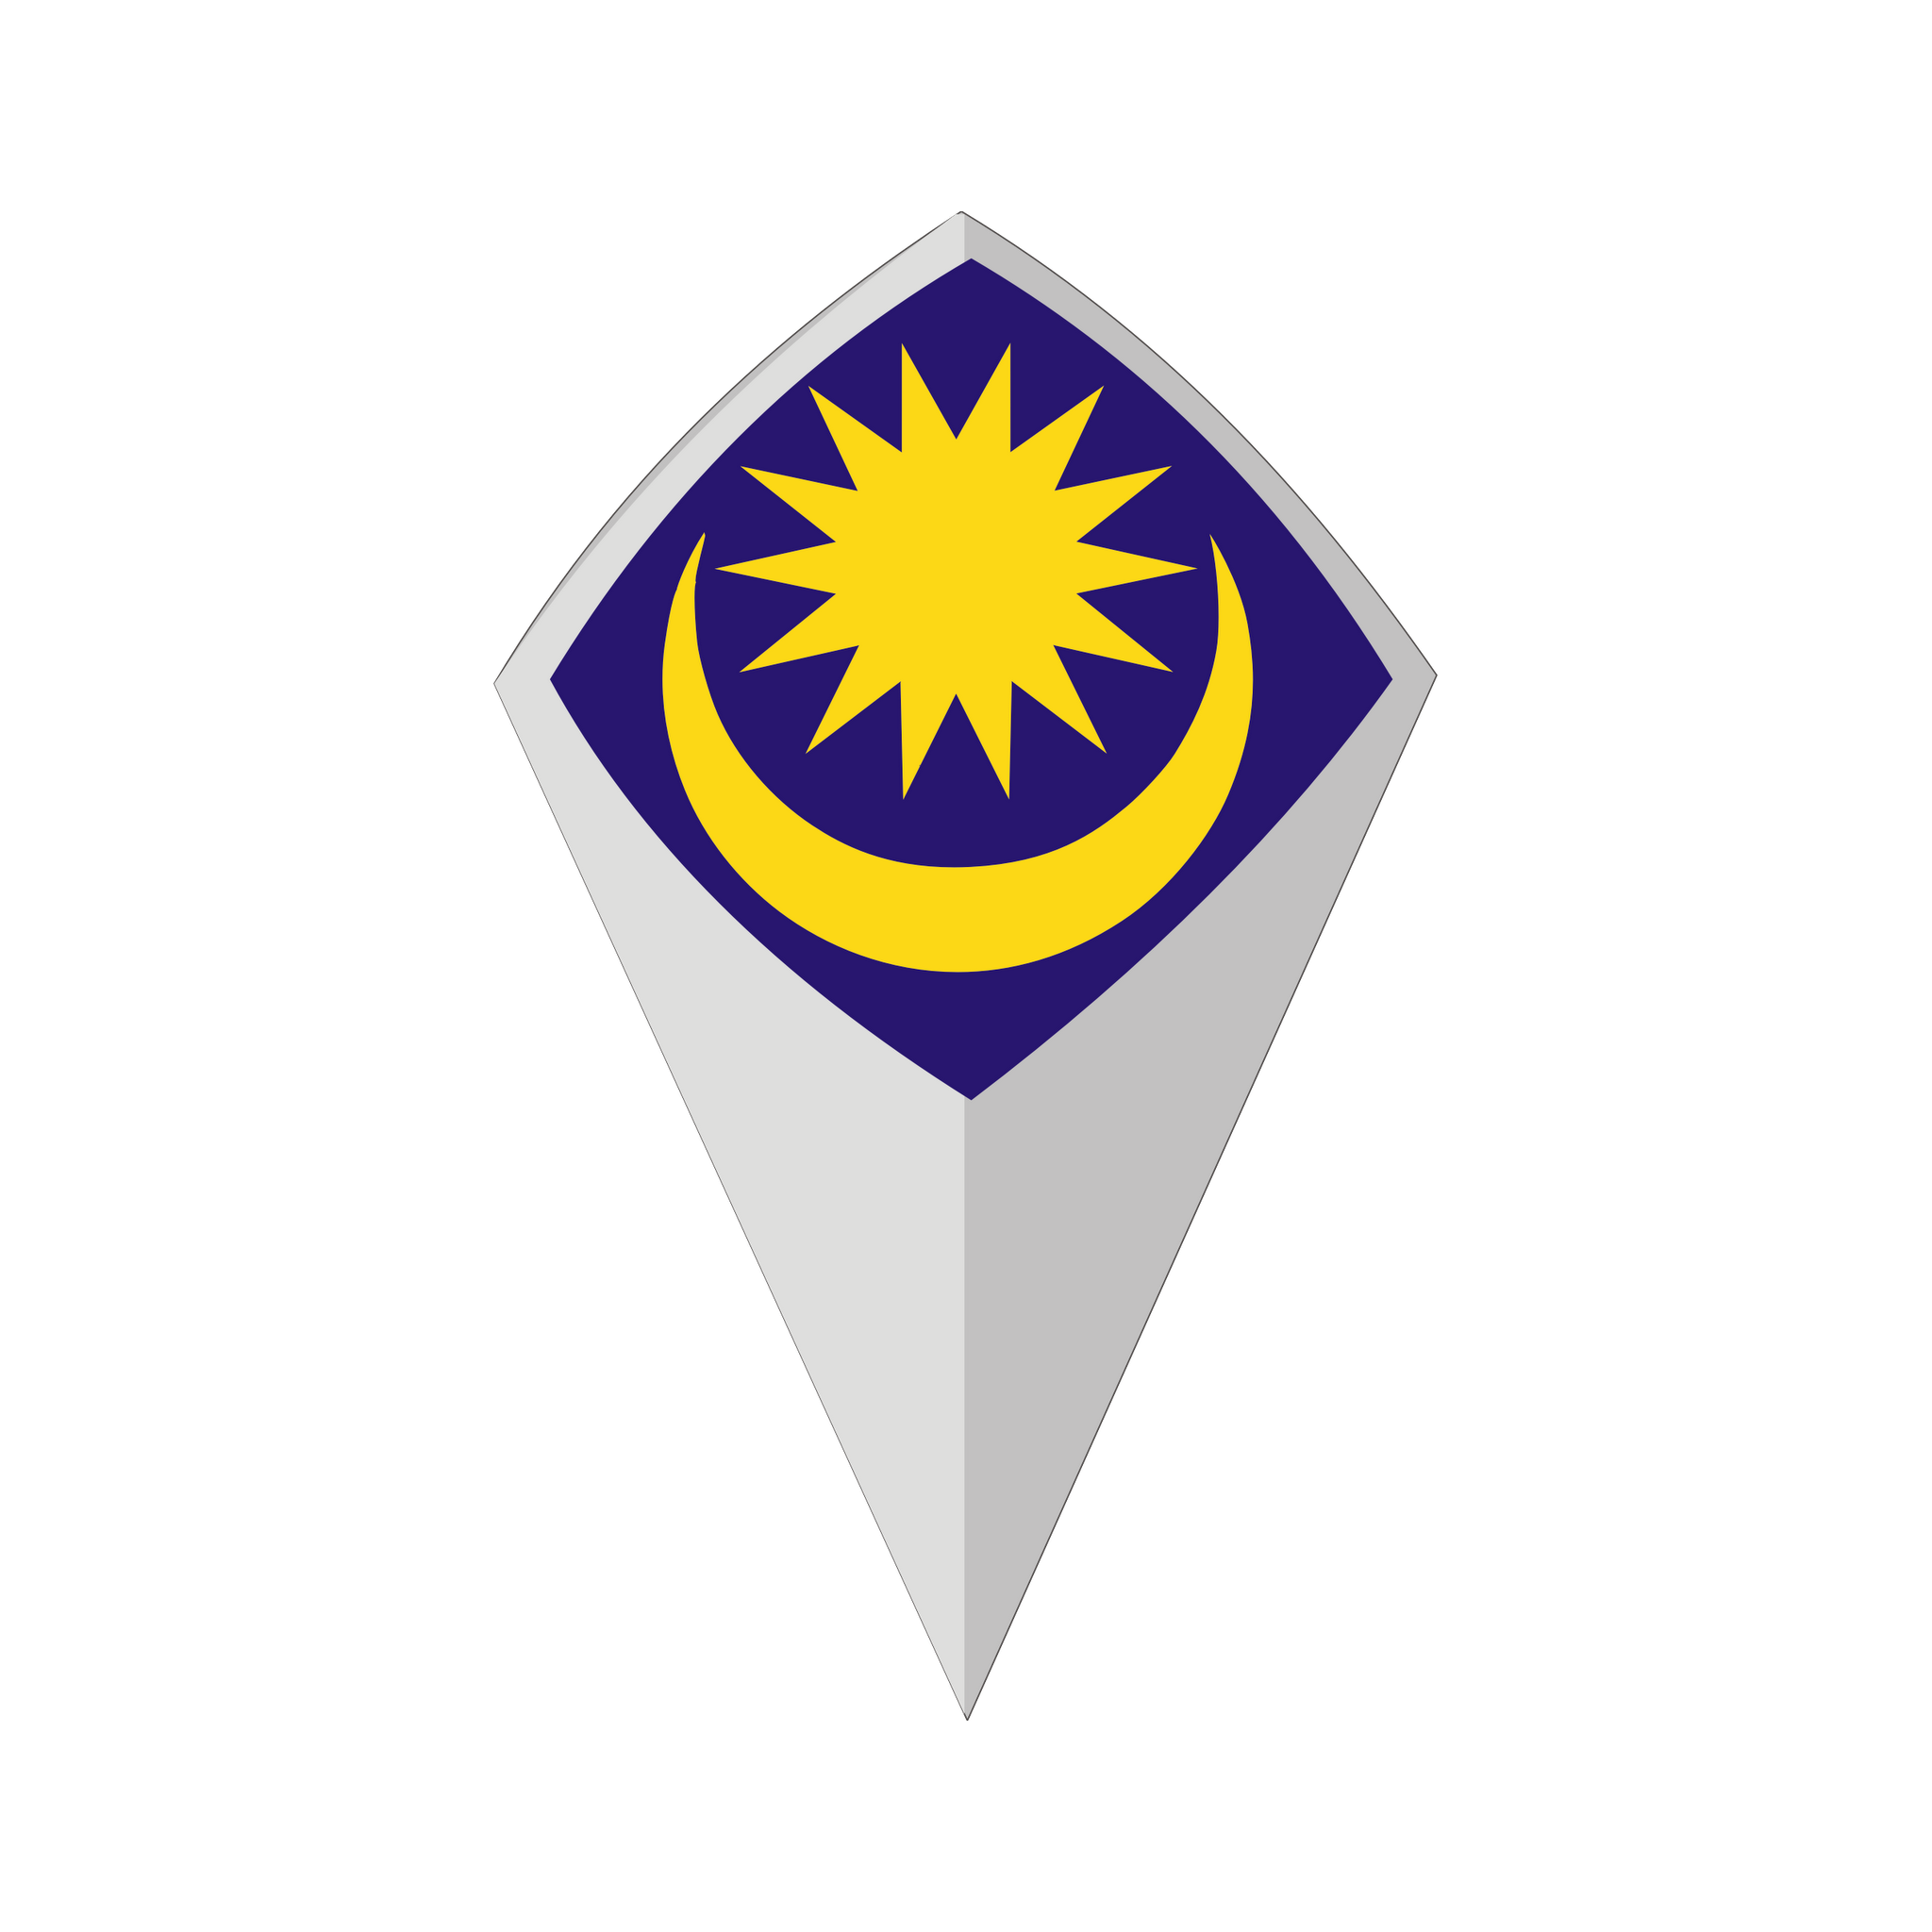 Proton Logo, HD Png, Meaning, Information  Carlogos.org